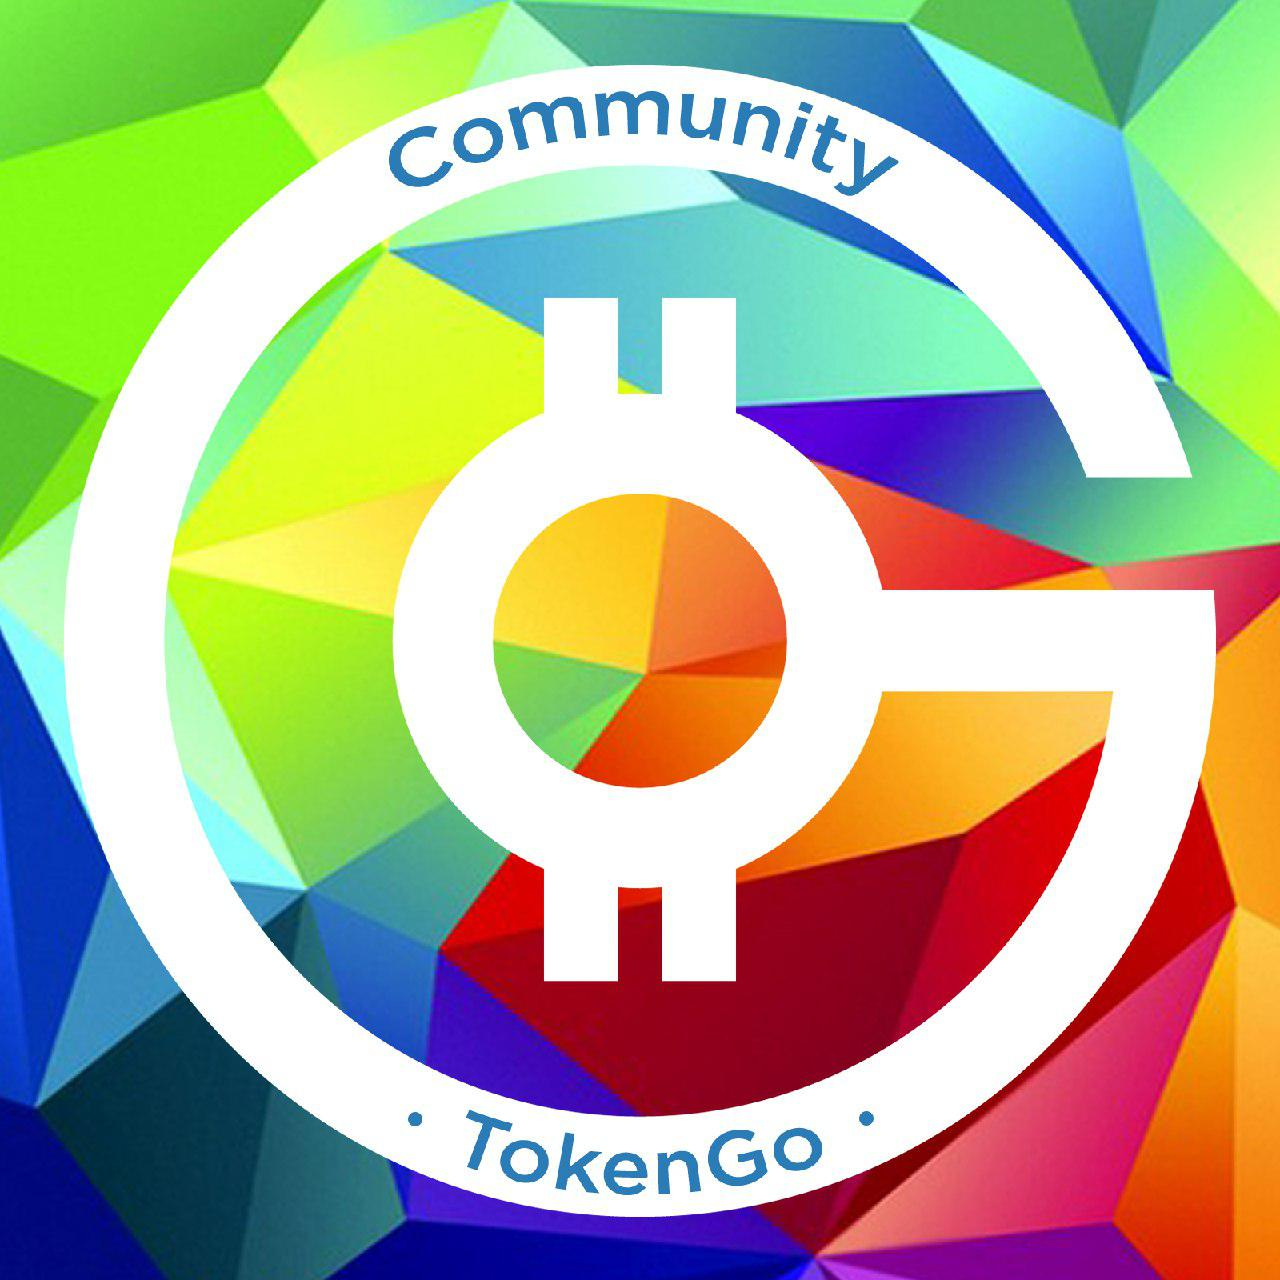 TokenGo_Community11.jpg